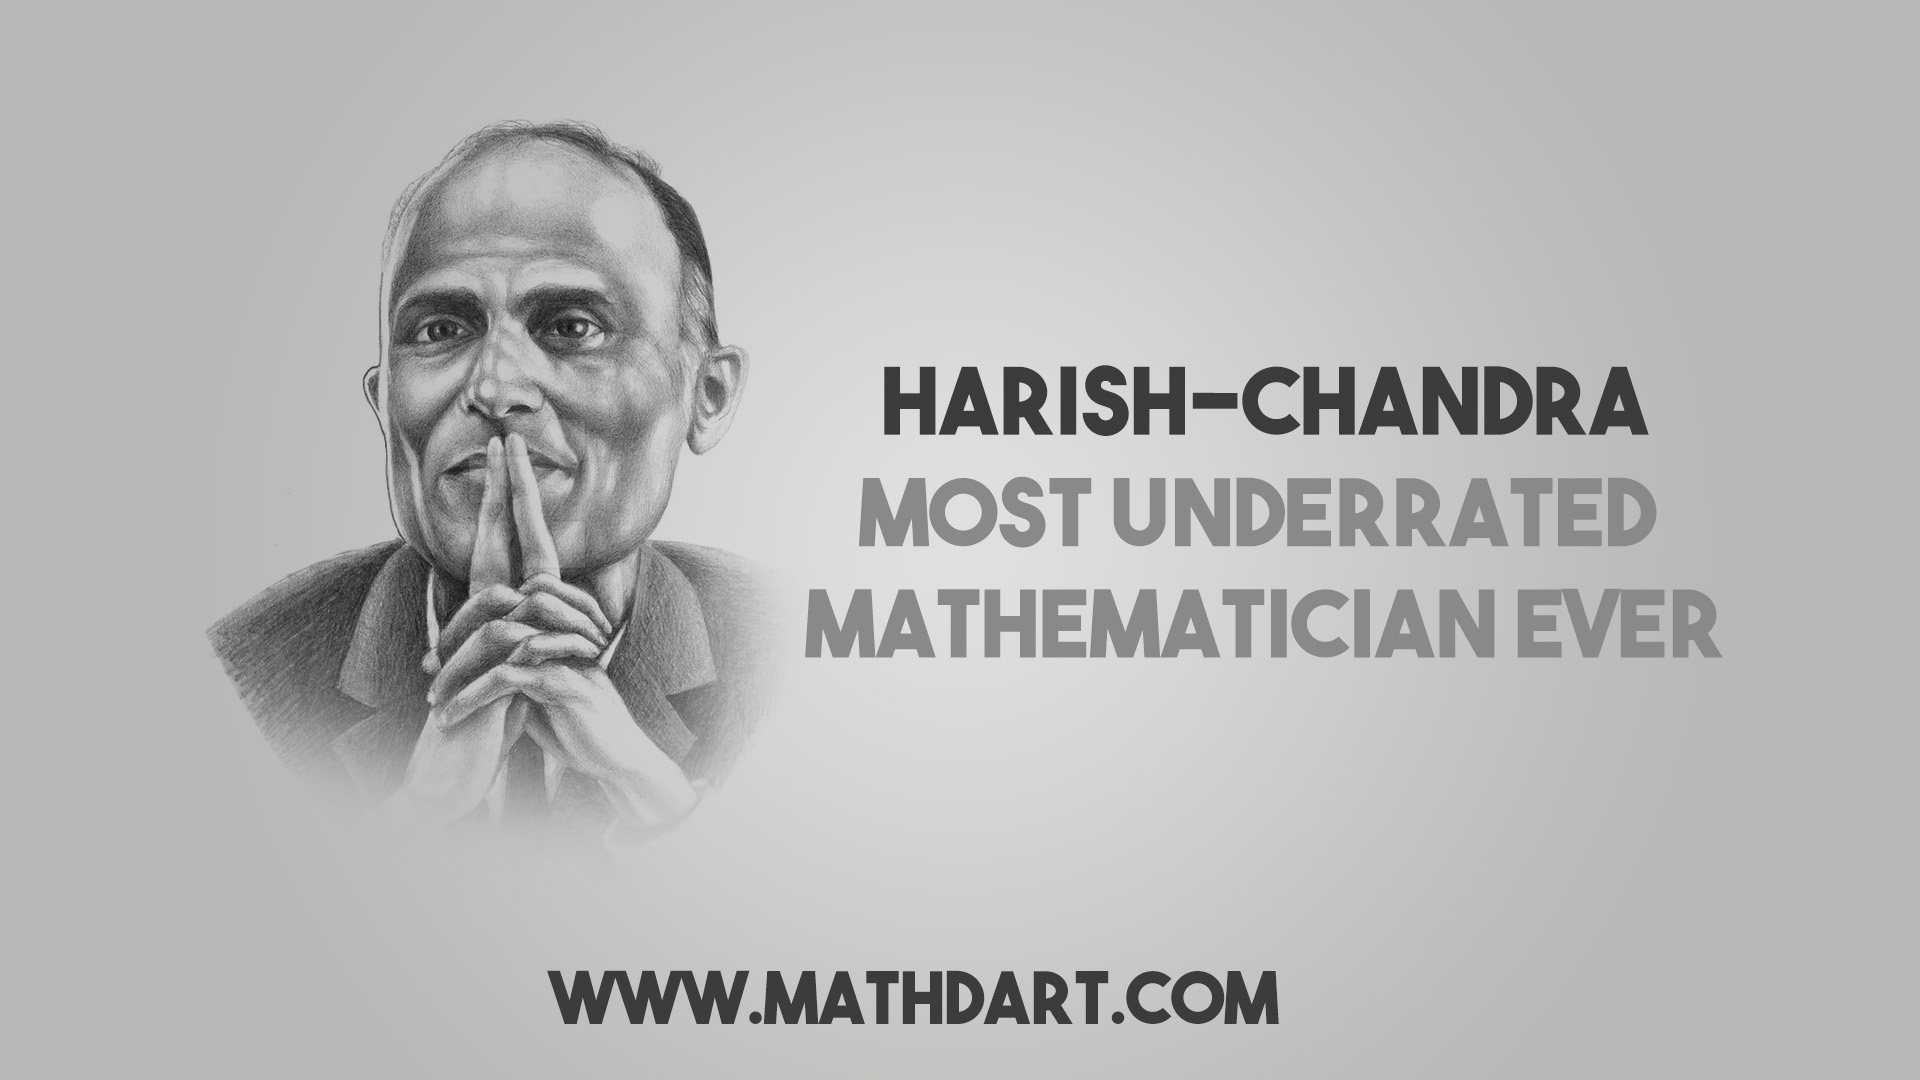 Harish-Chandra: Most Underrated Mathematician Ever